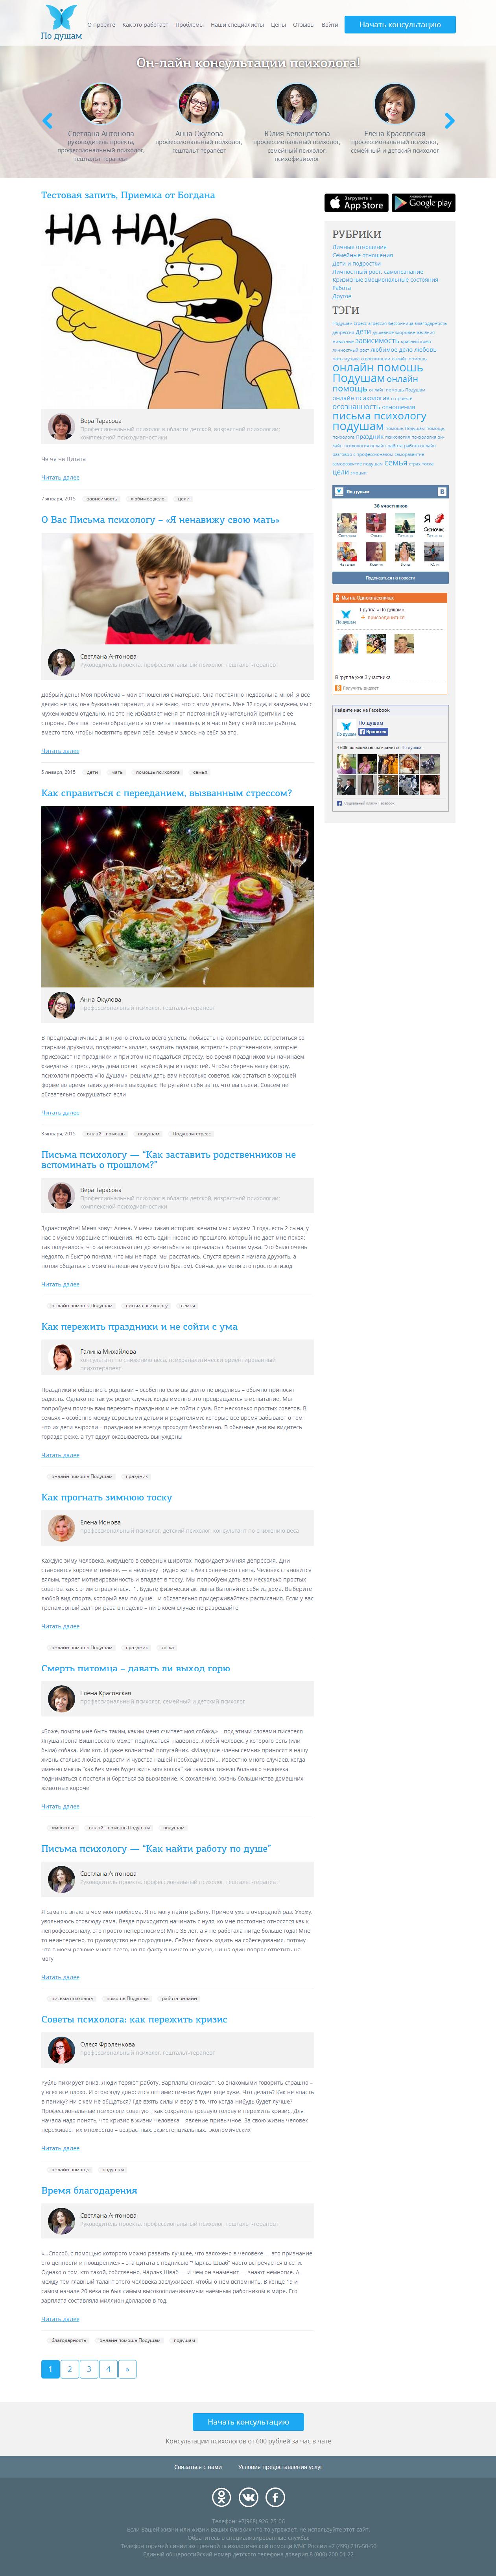 Перенос блога на Wordpress и натяжка верстки блога на движок